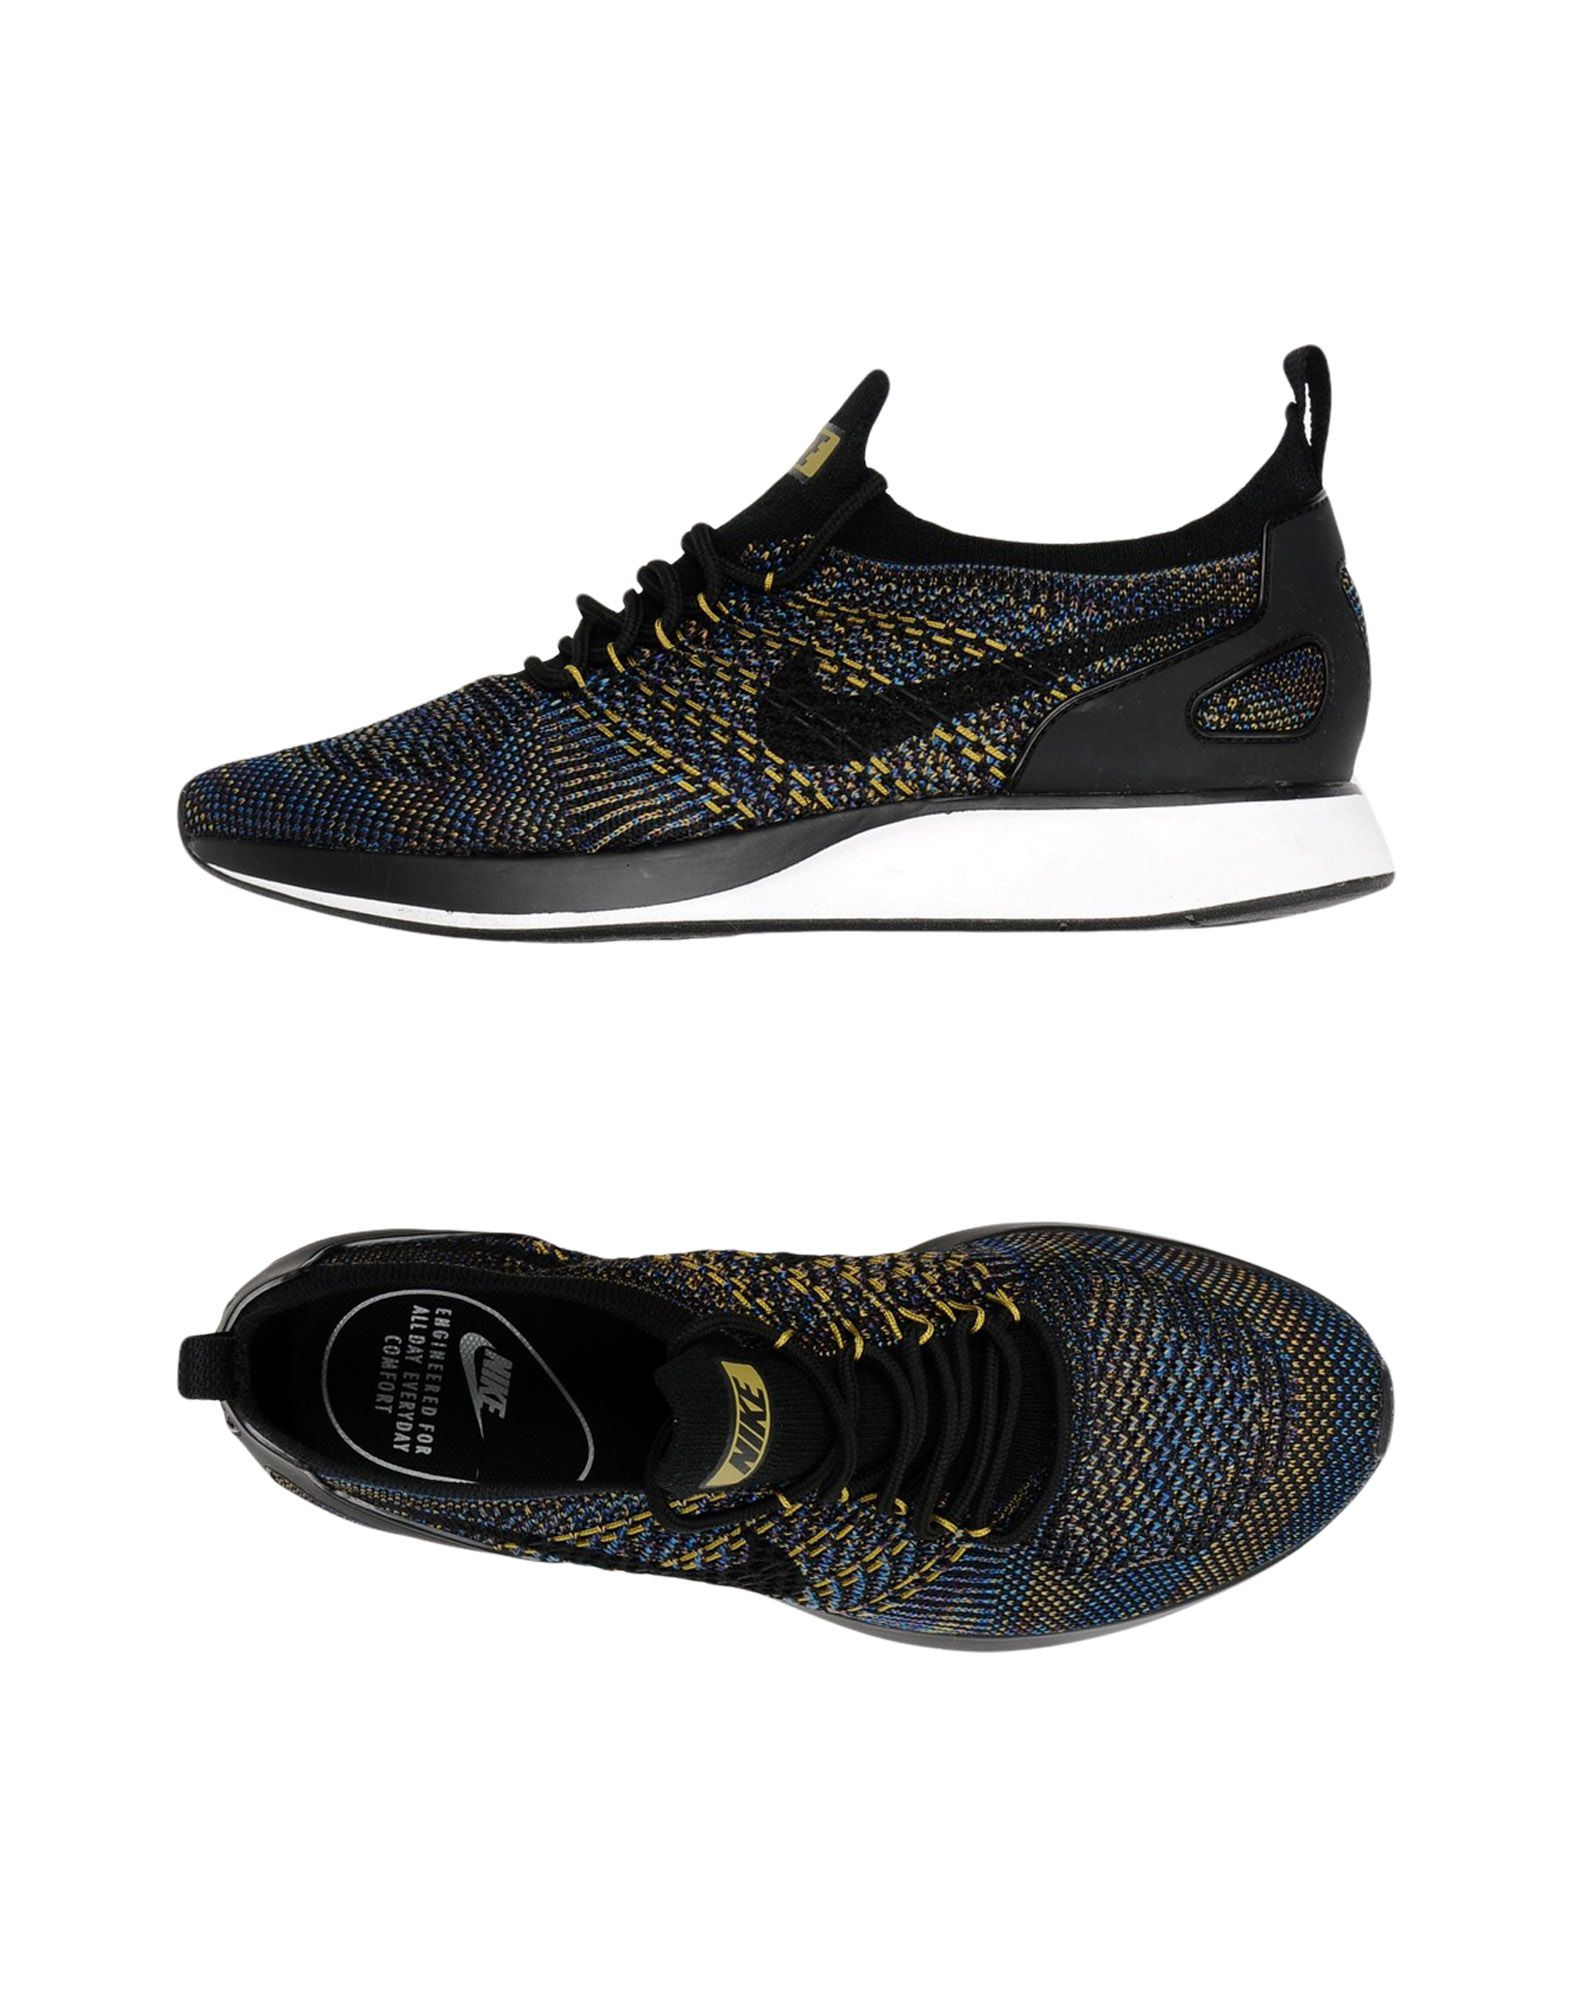 Scarpe da - Ginnastica Nike Air Zoom Mariah Fk Racer - da Donna - 11382587GV 6ba004